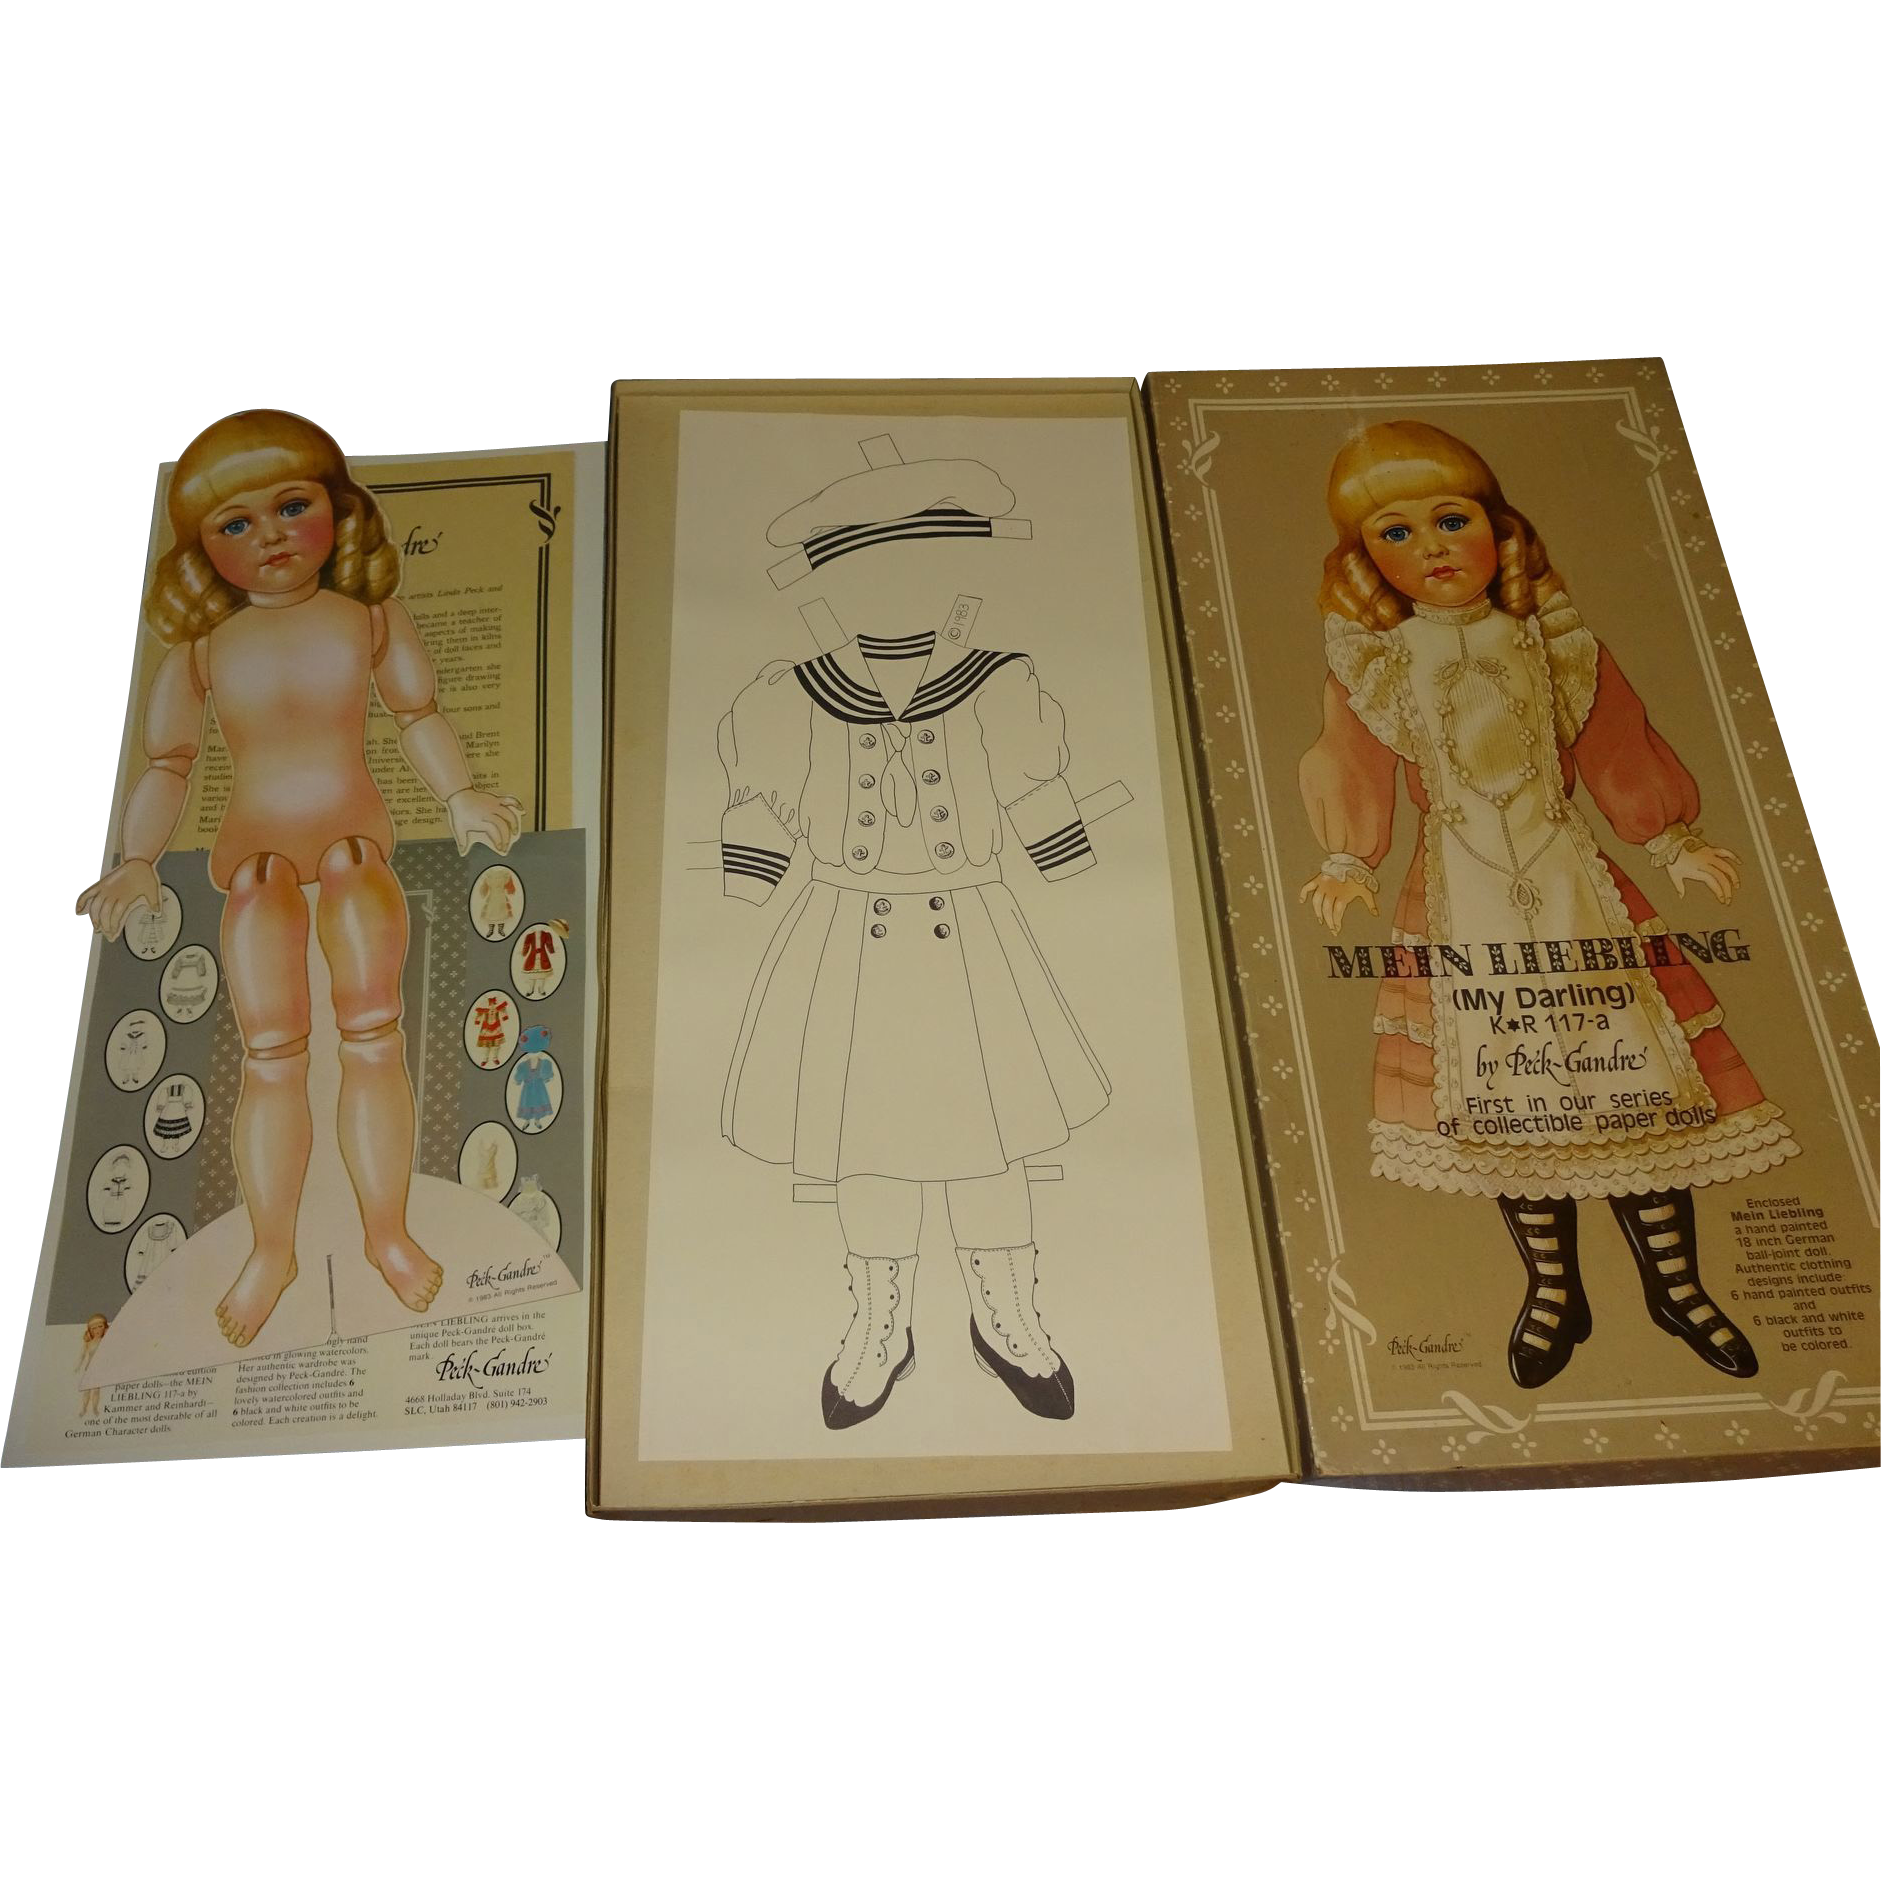 Mein Liebling  by Peck-Gandre Vintage Paper Dolls